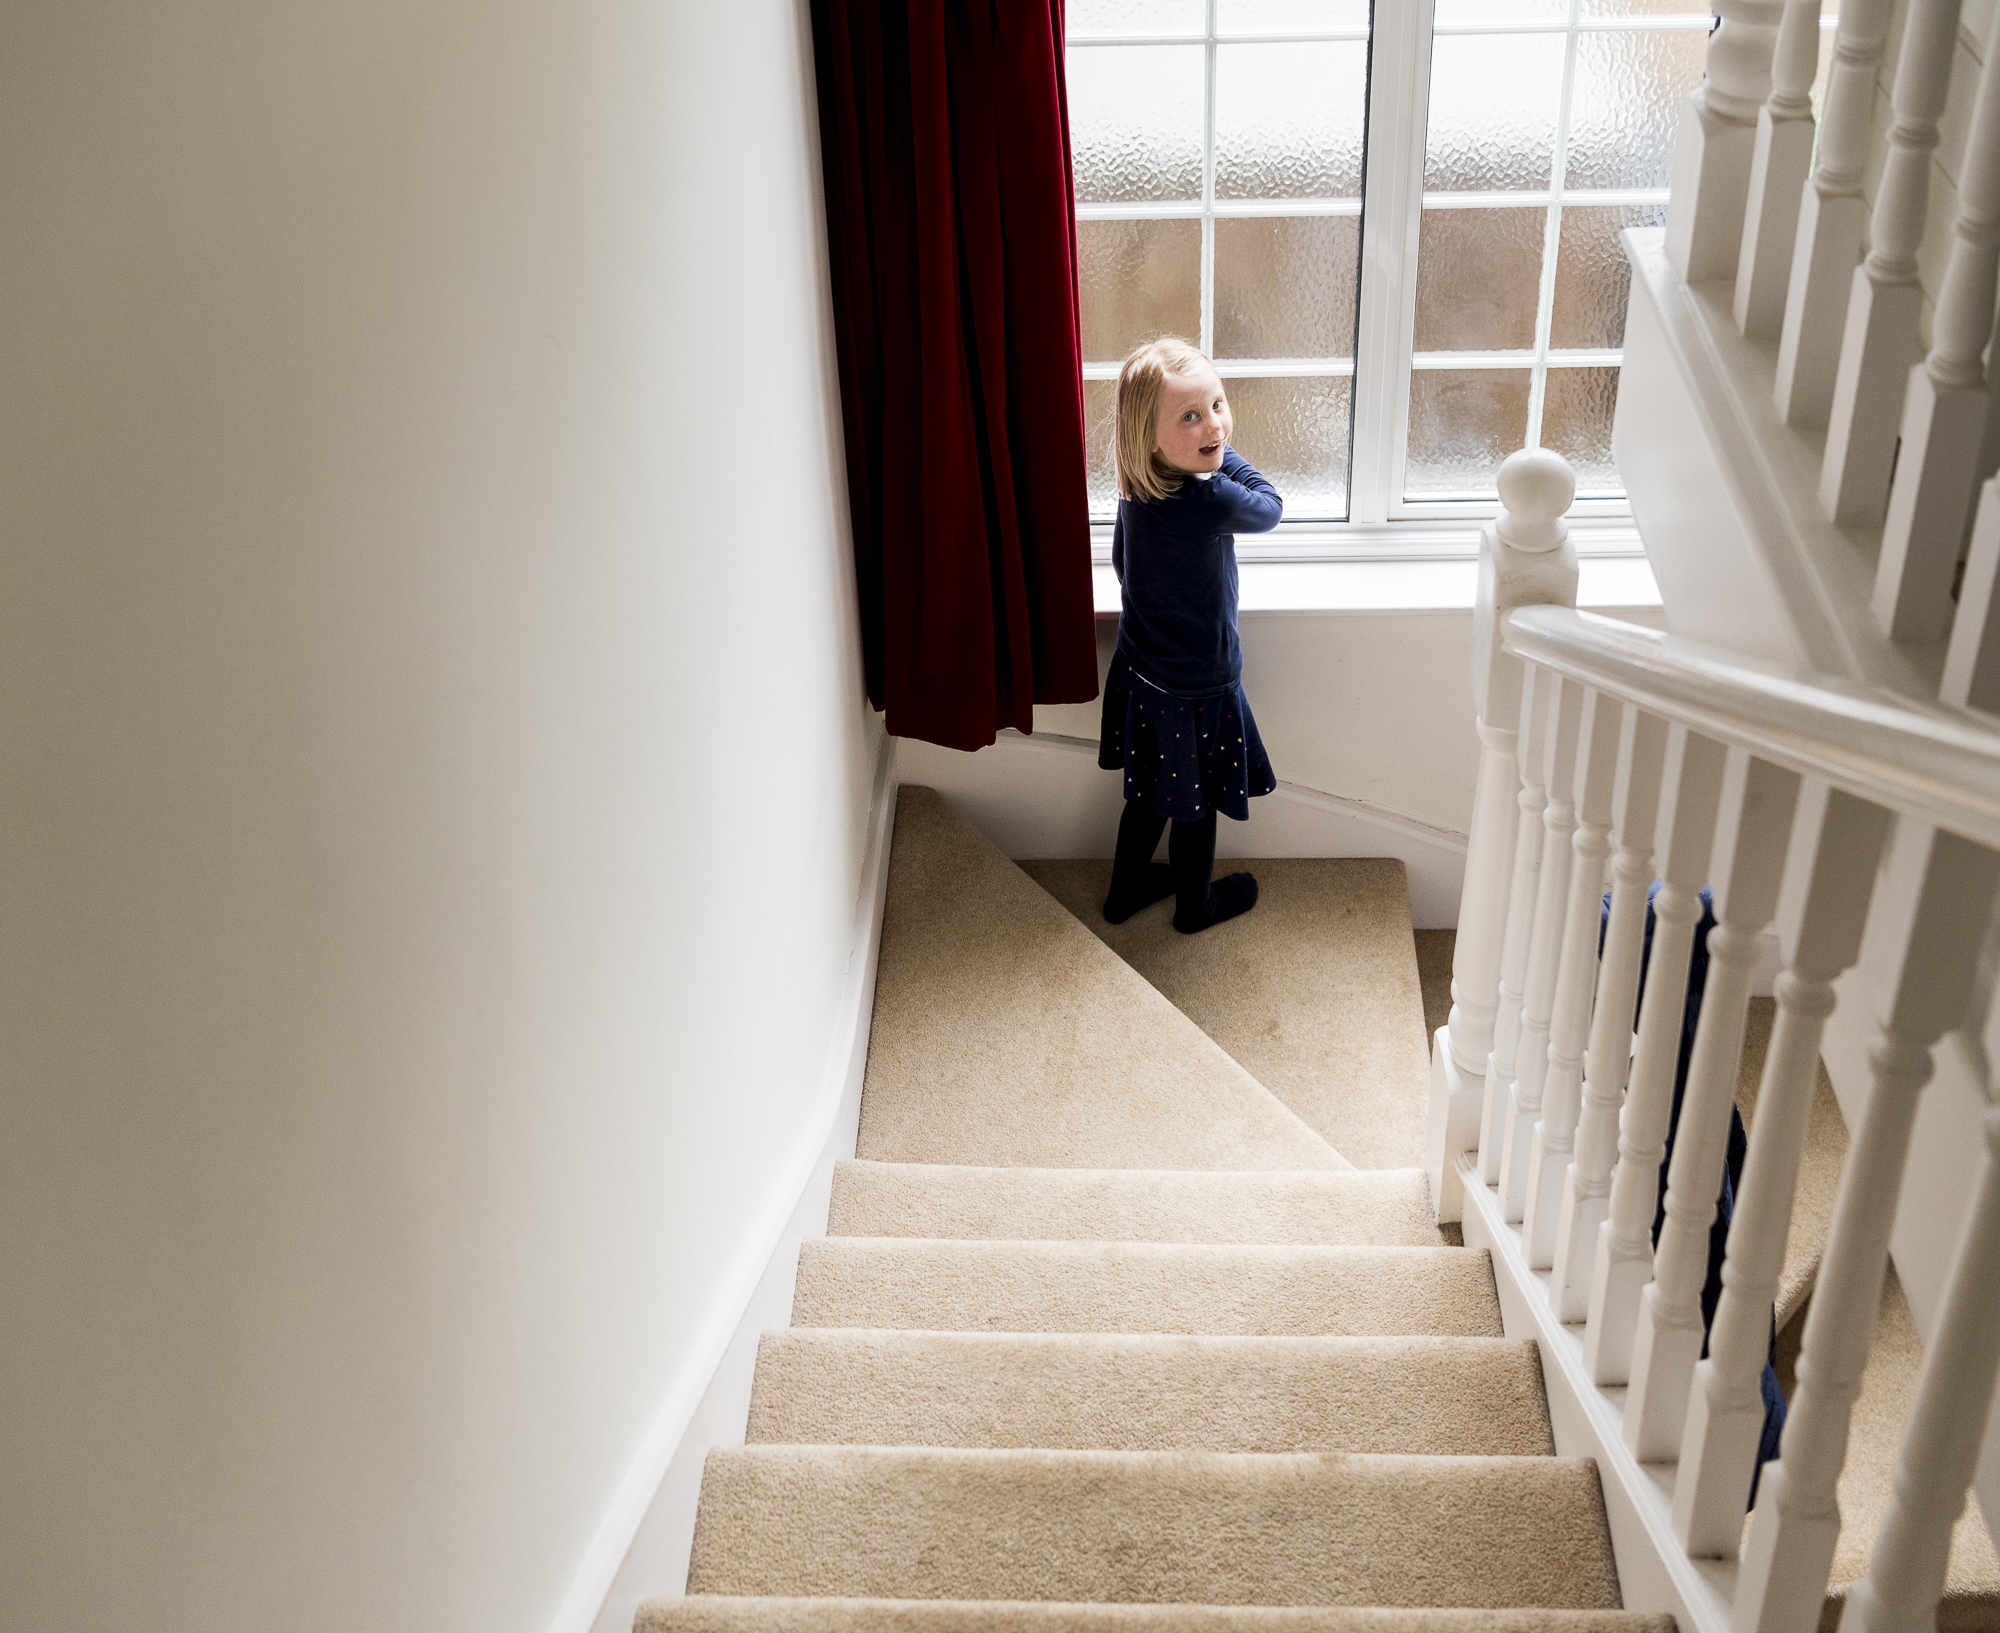 sally-hornung-photography-girl-on-stairs.jpg